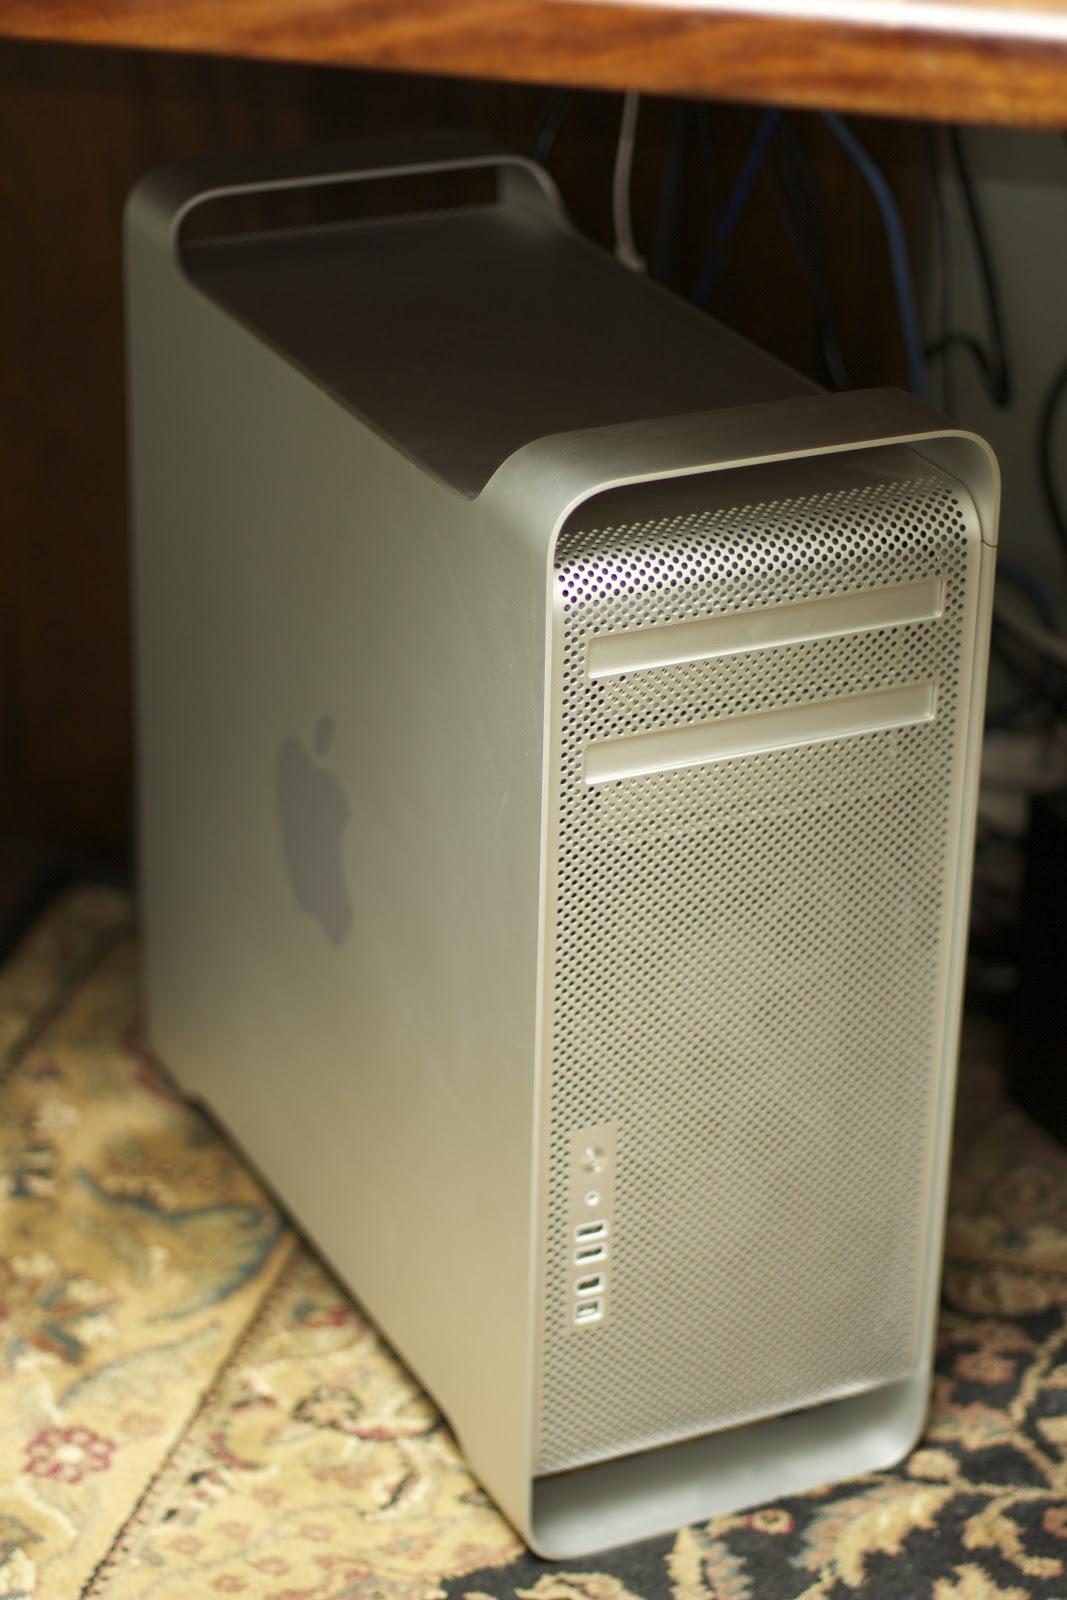 Mac Professional Makeup Artist Kit: Upgrading A Mac Pro To SSD